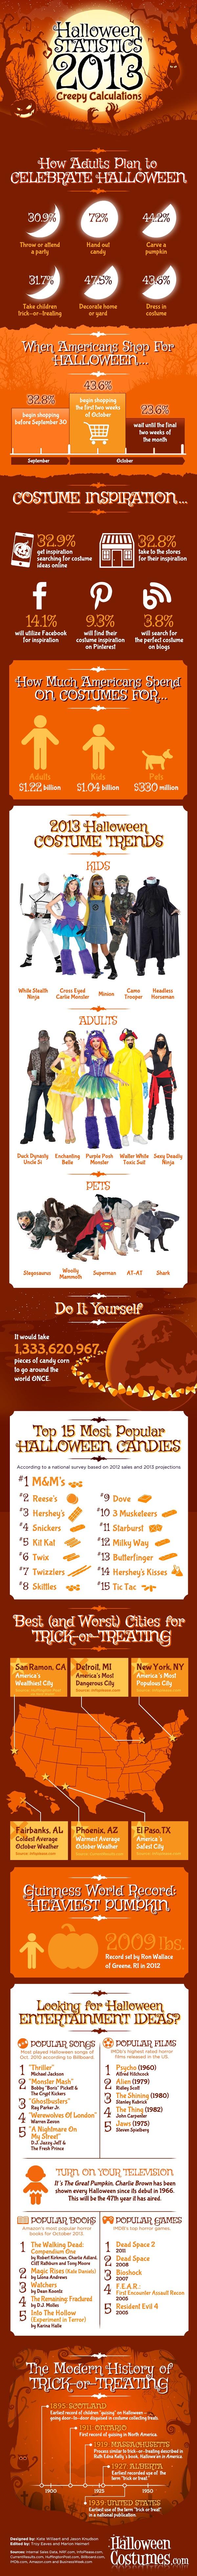 2013-halloween-statistics